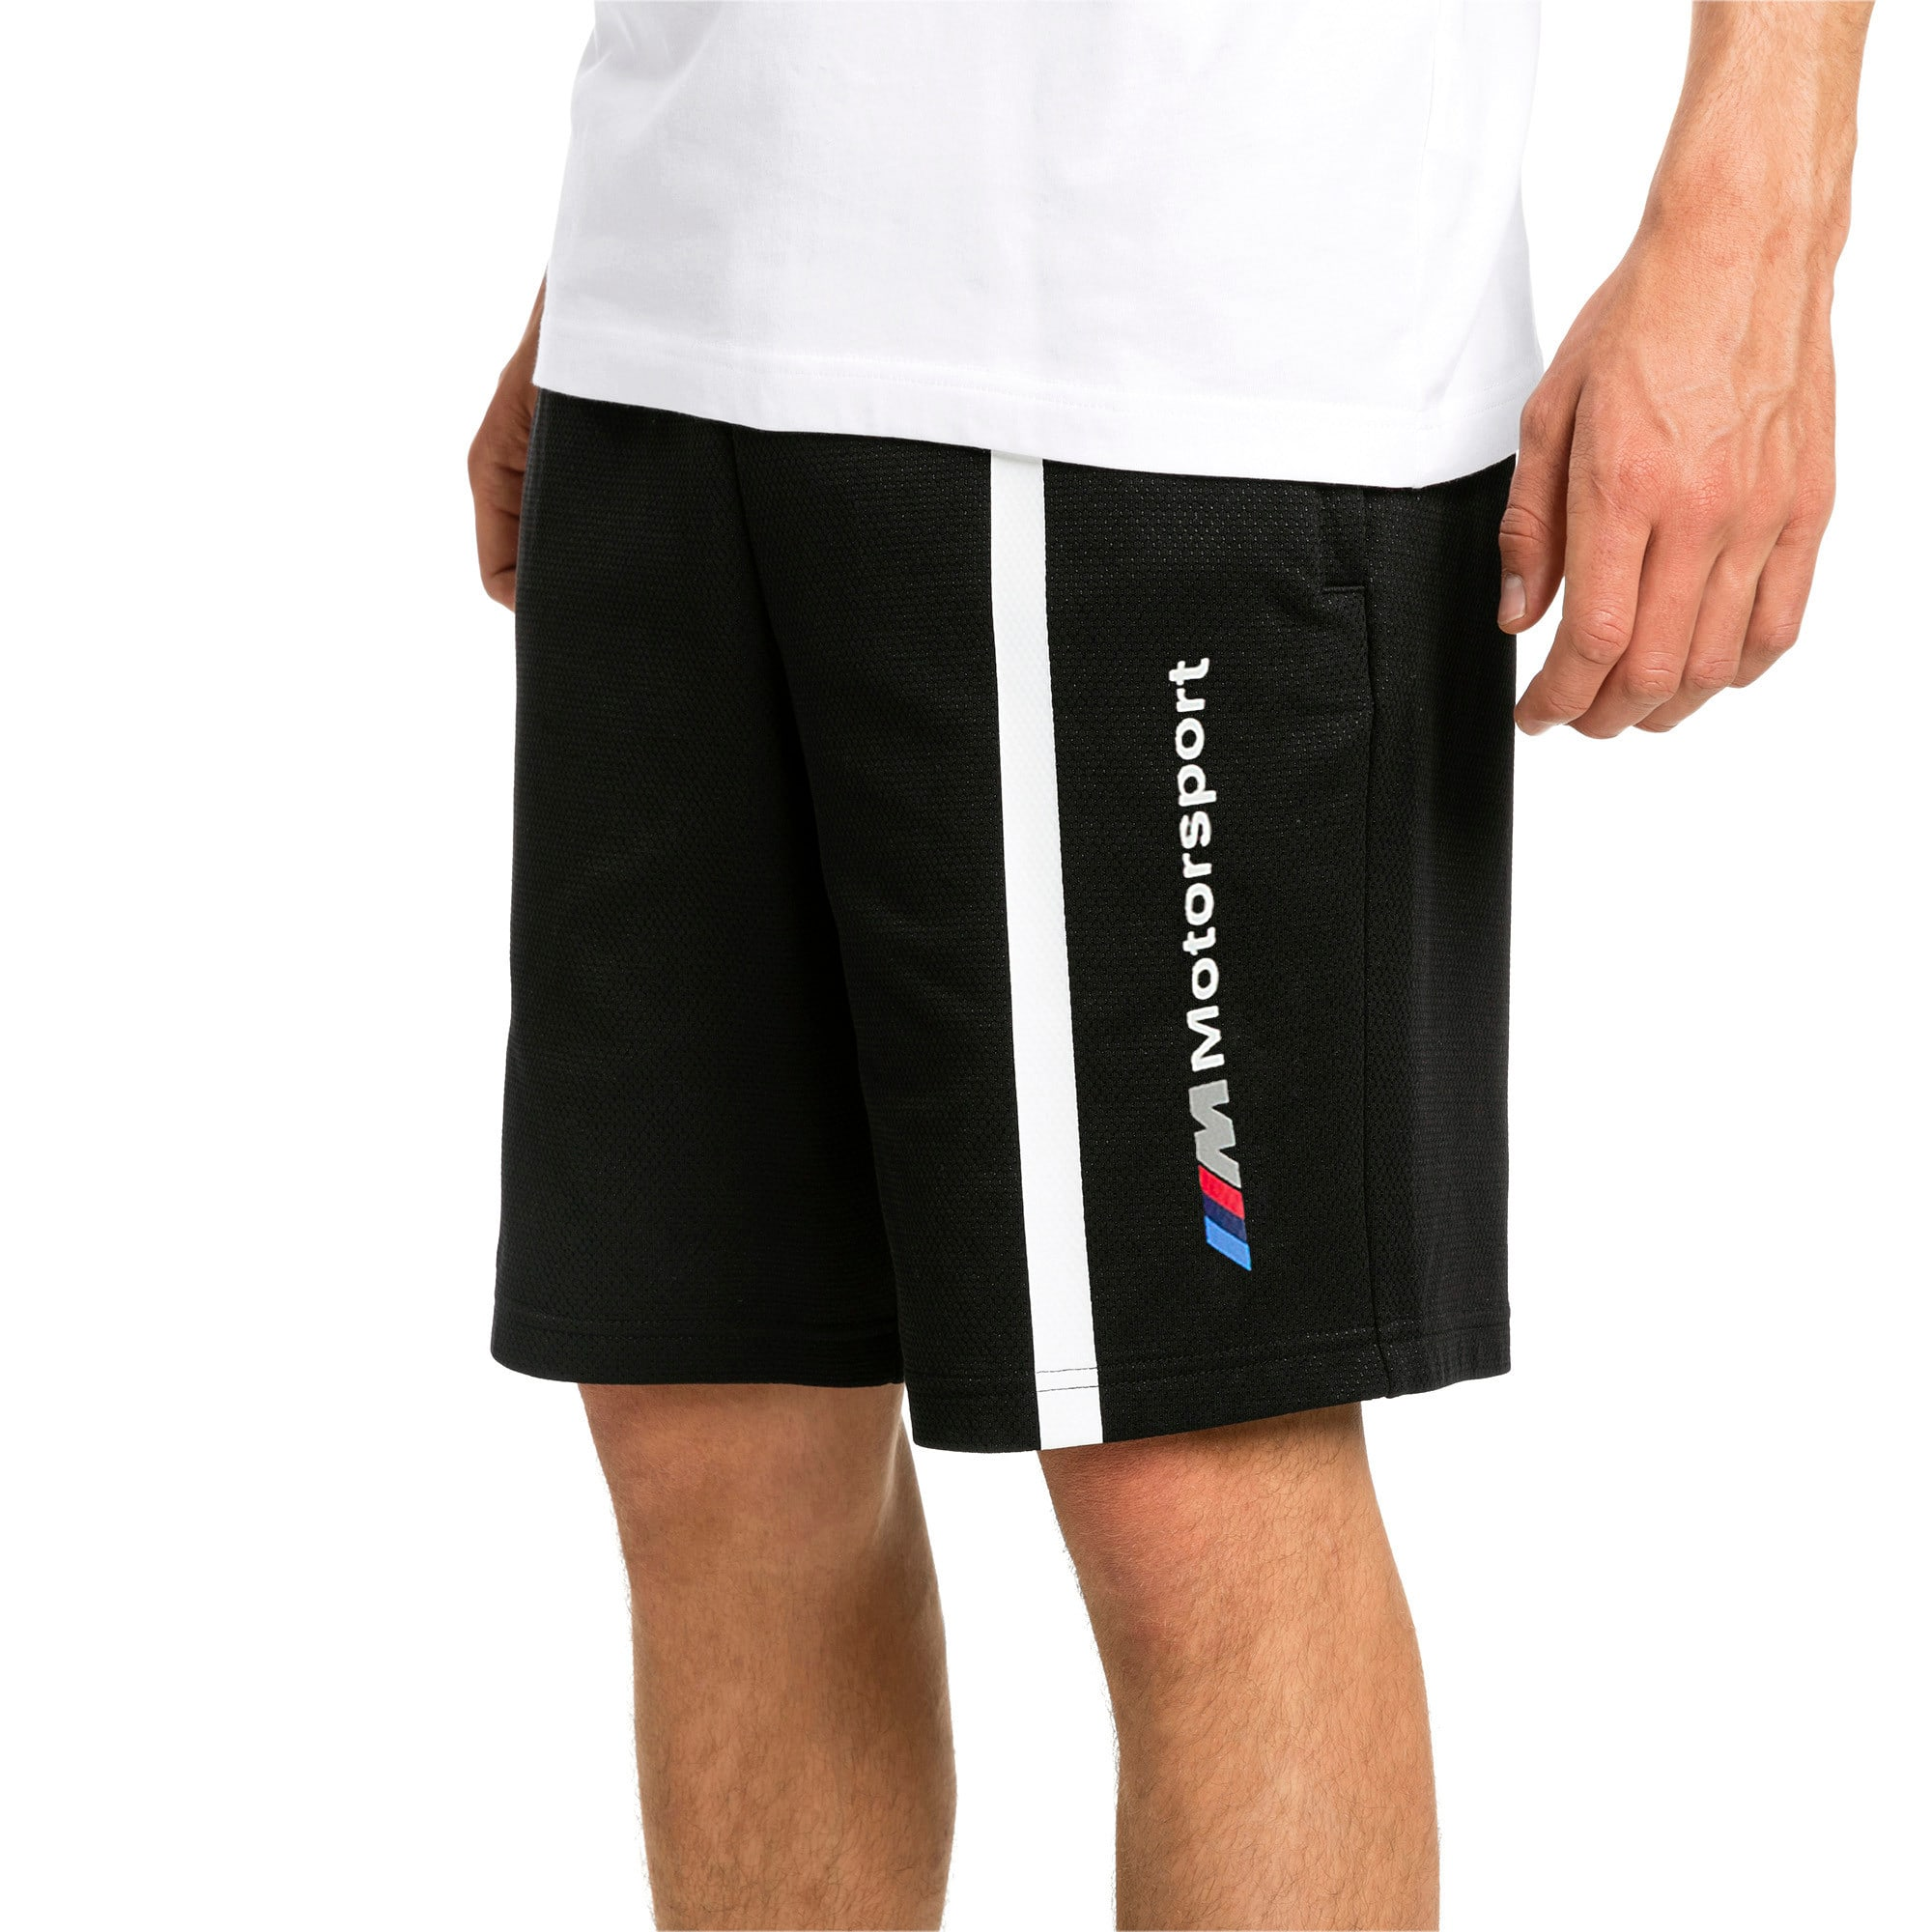 Miniatura 1 de Shorts deportivos BMW M Motorsport para hombre, Puma Black, mediano